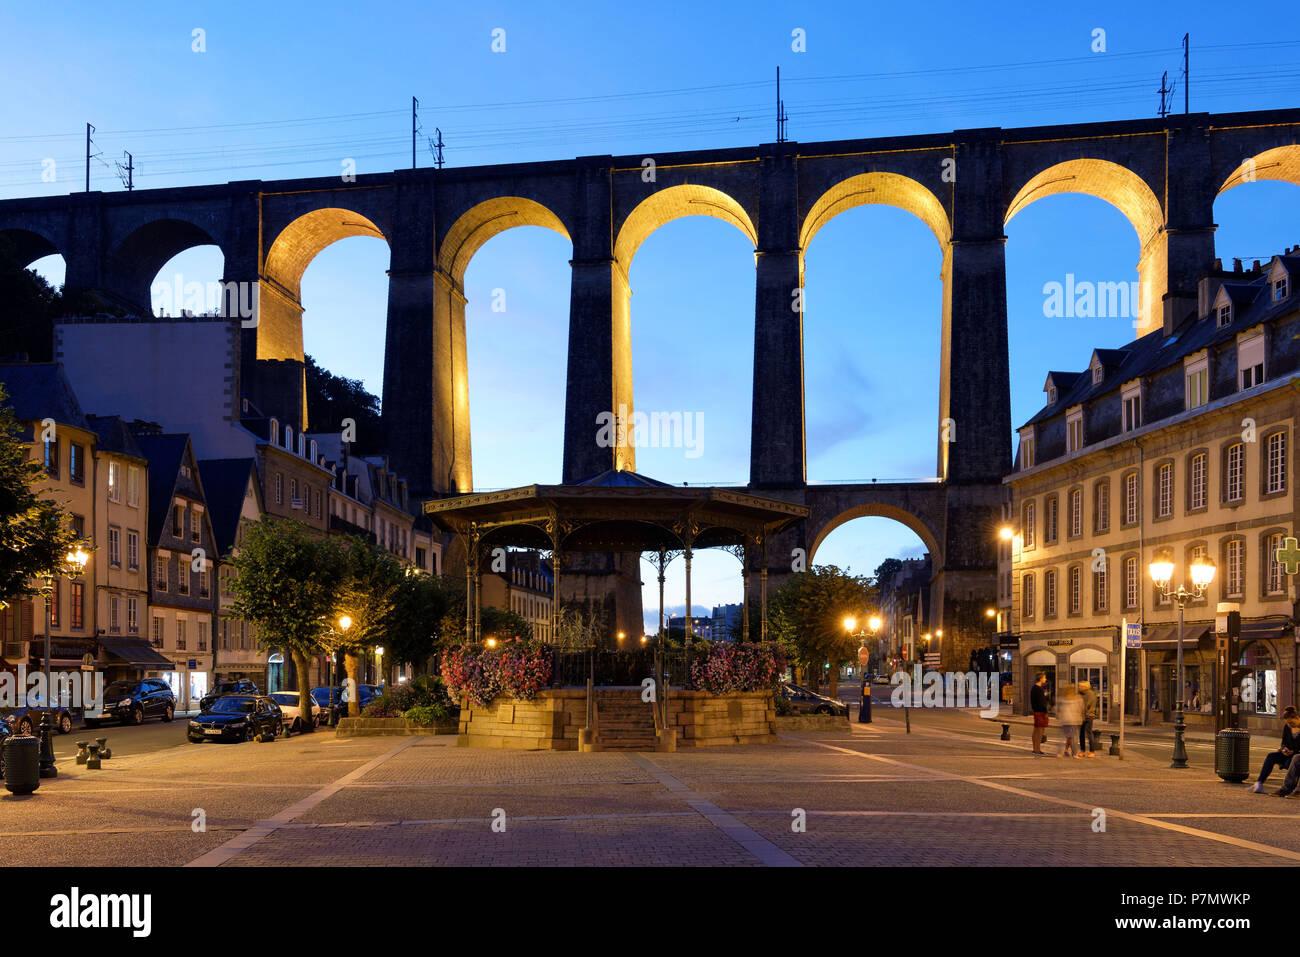 France, Finistere, Morlaix, place des Otages, viaduct - Stock Image